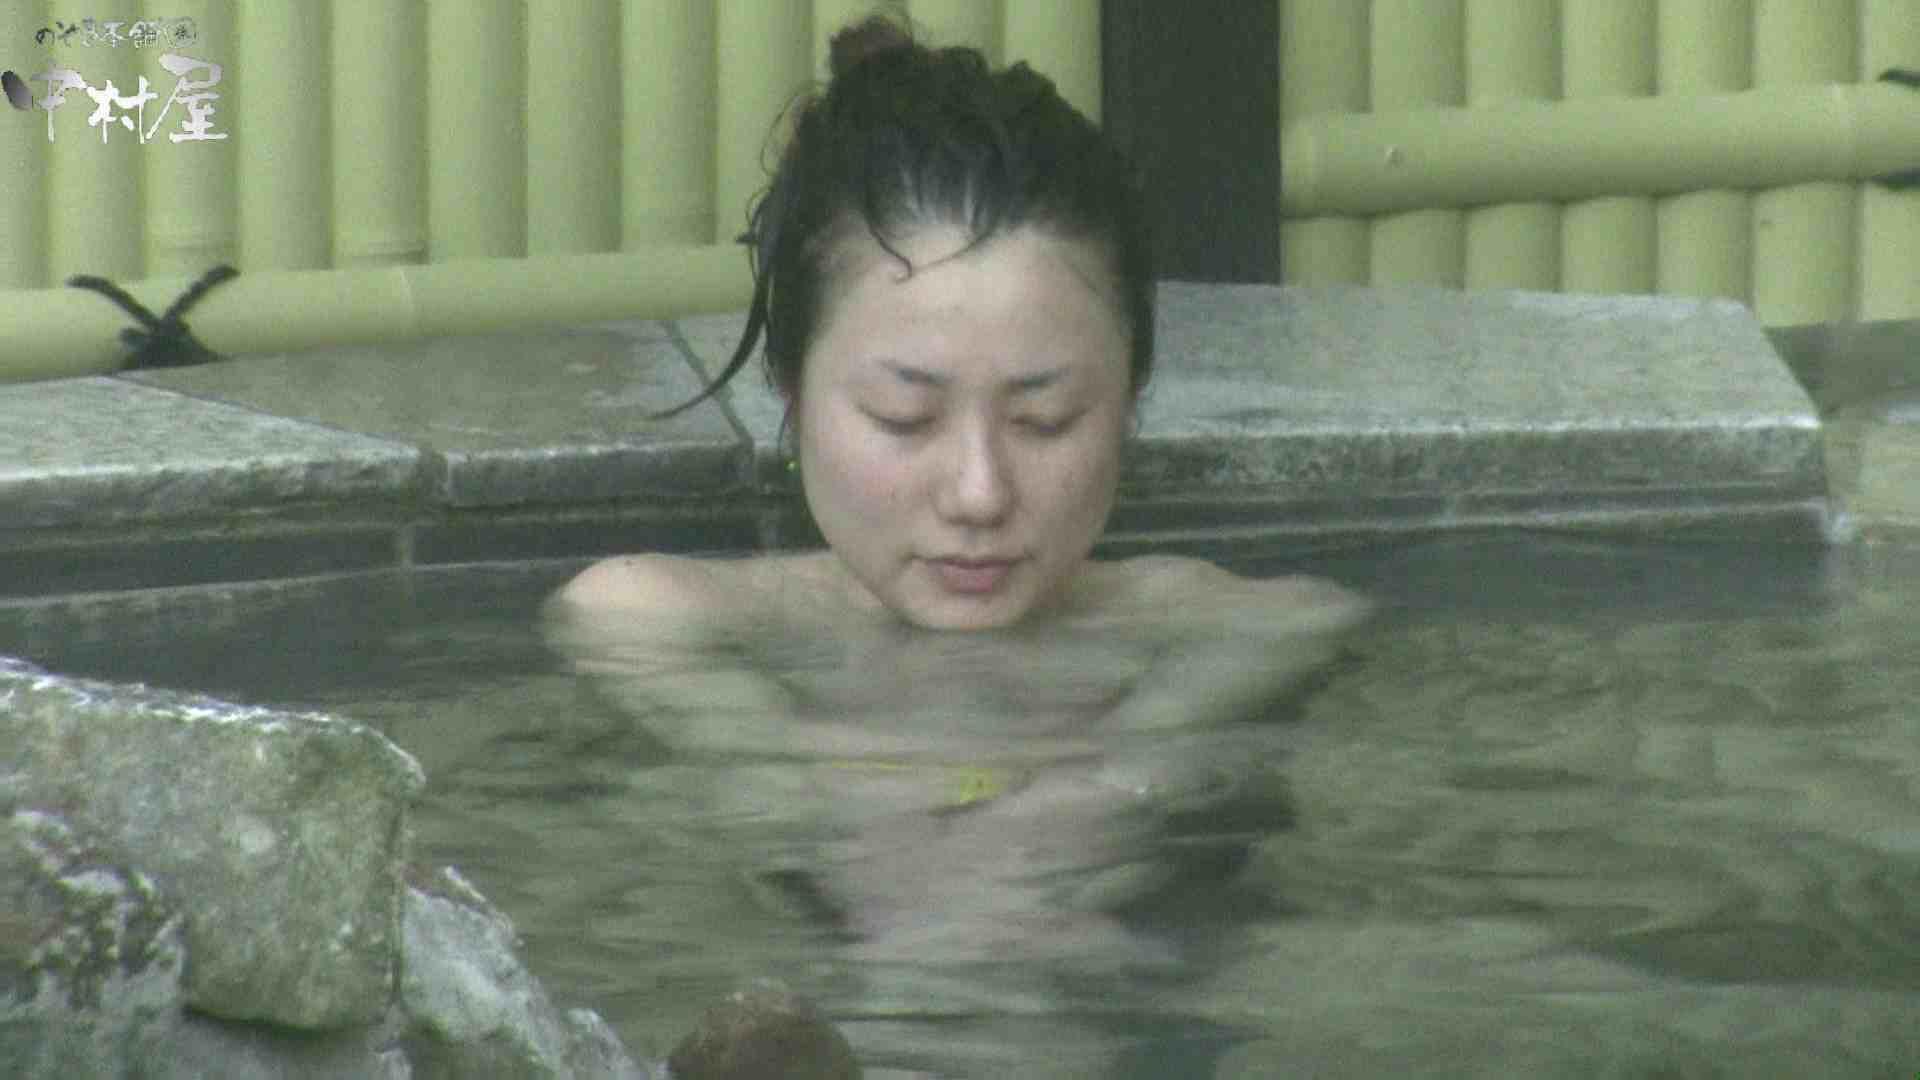 Aquaな露天風呂Vol.969 露天 のぞき動画画像 52画像 2